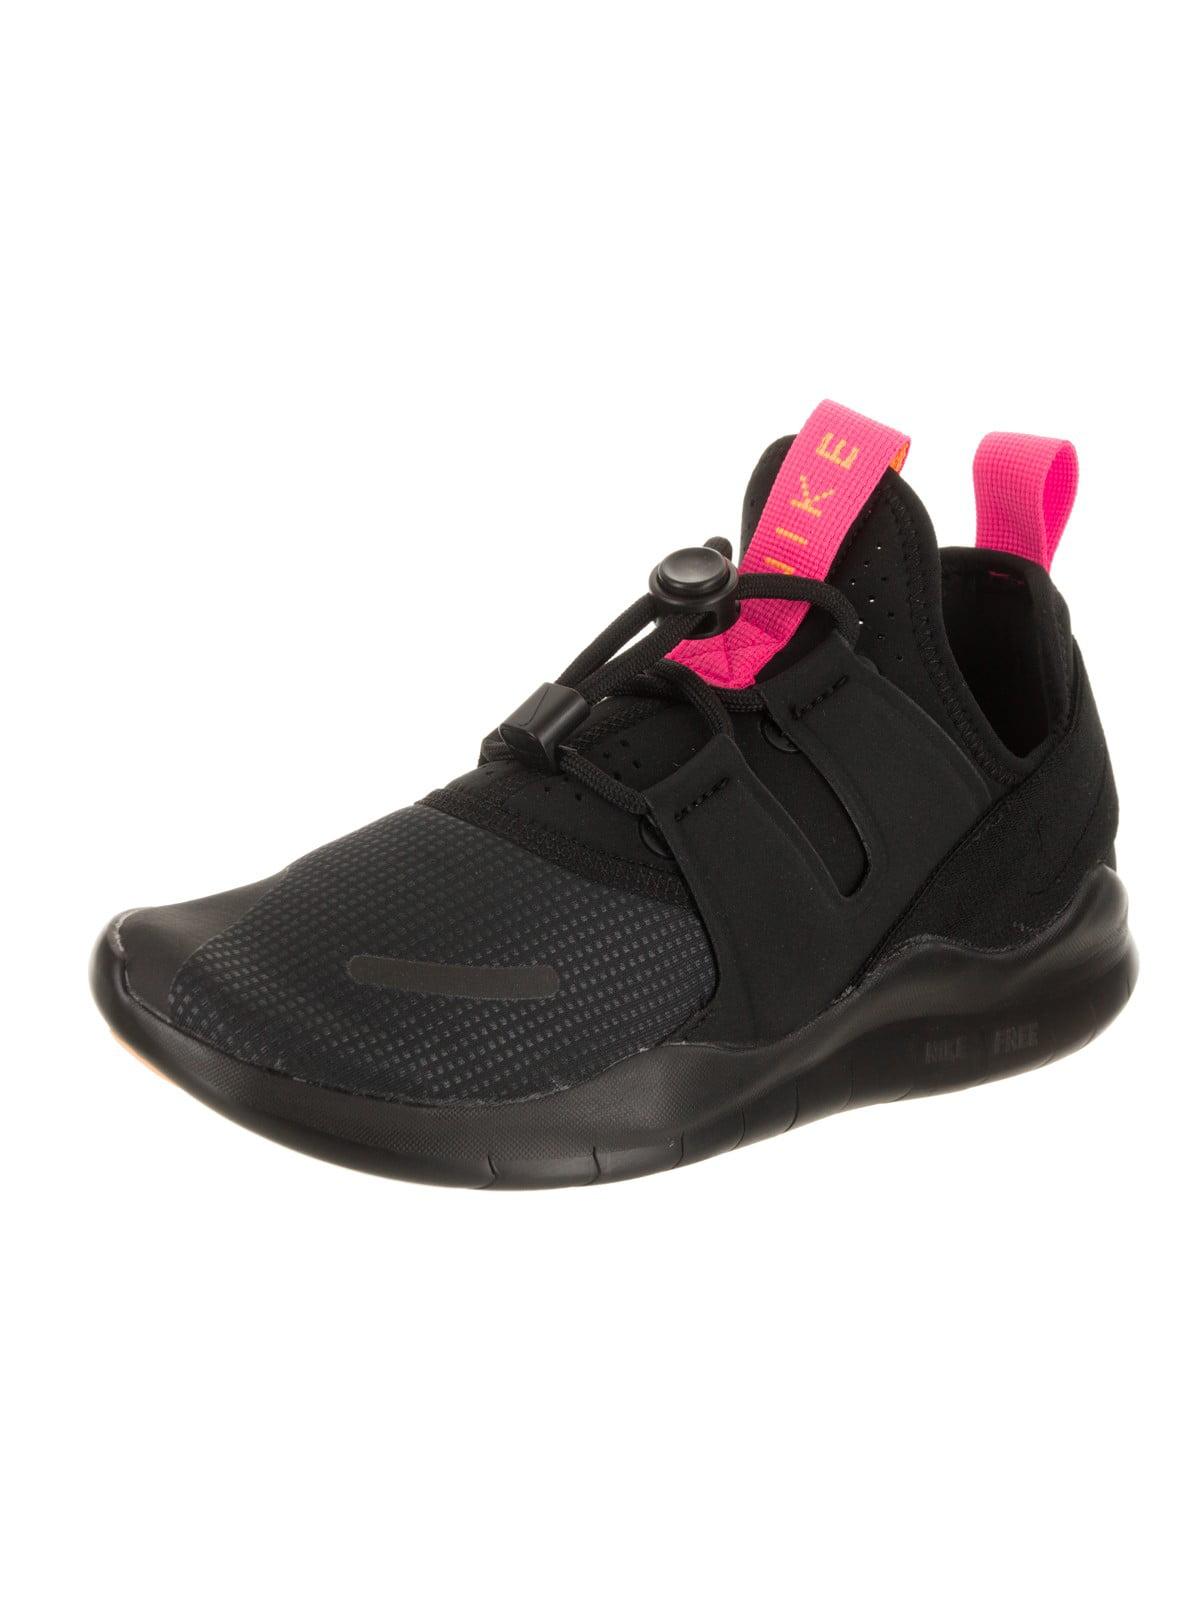 Nike Women's Free Rn Cmtr 2018 Running